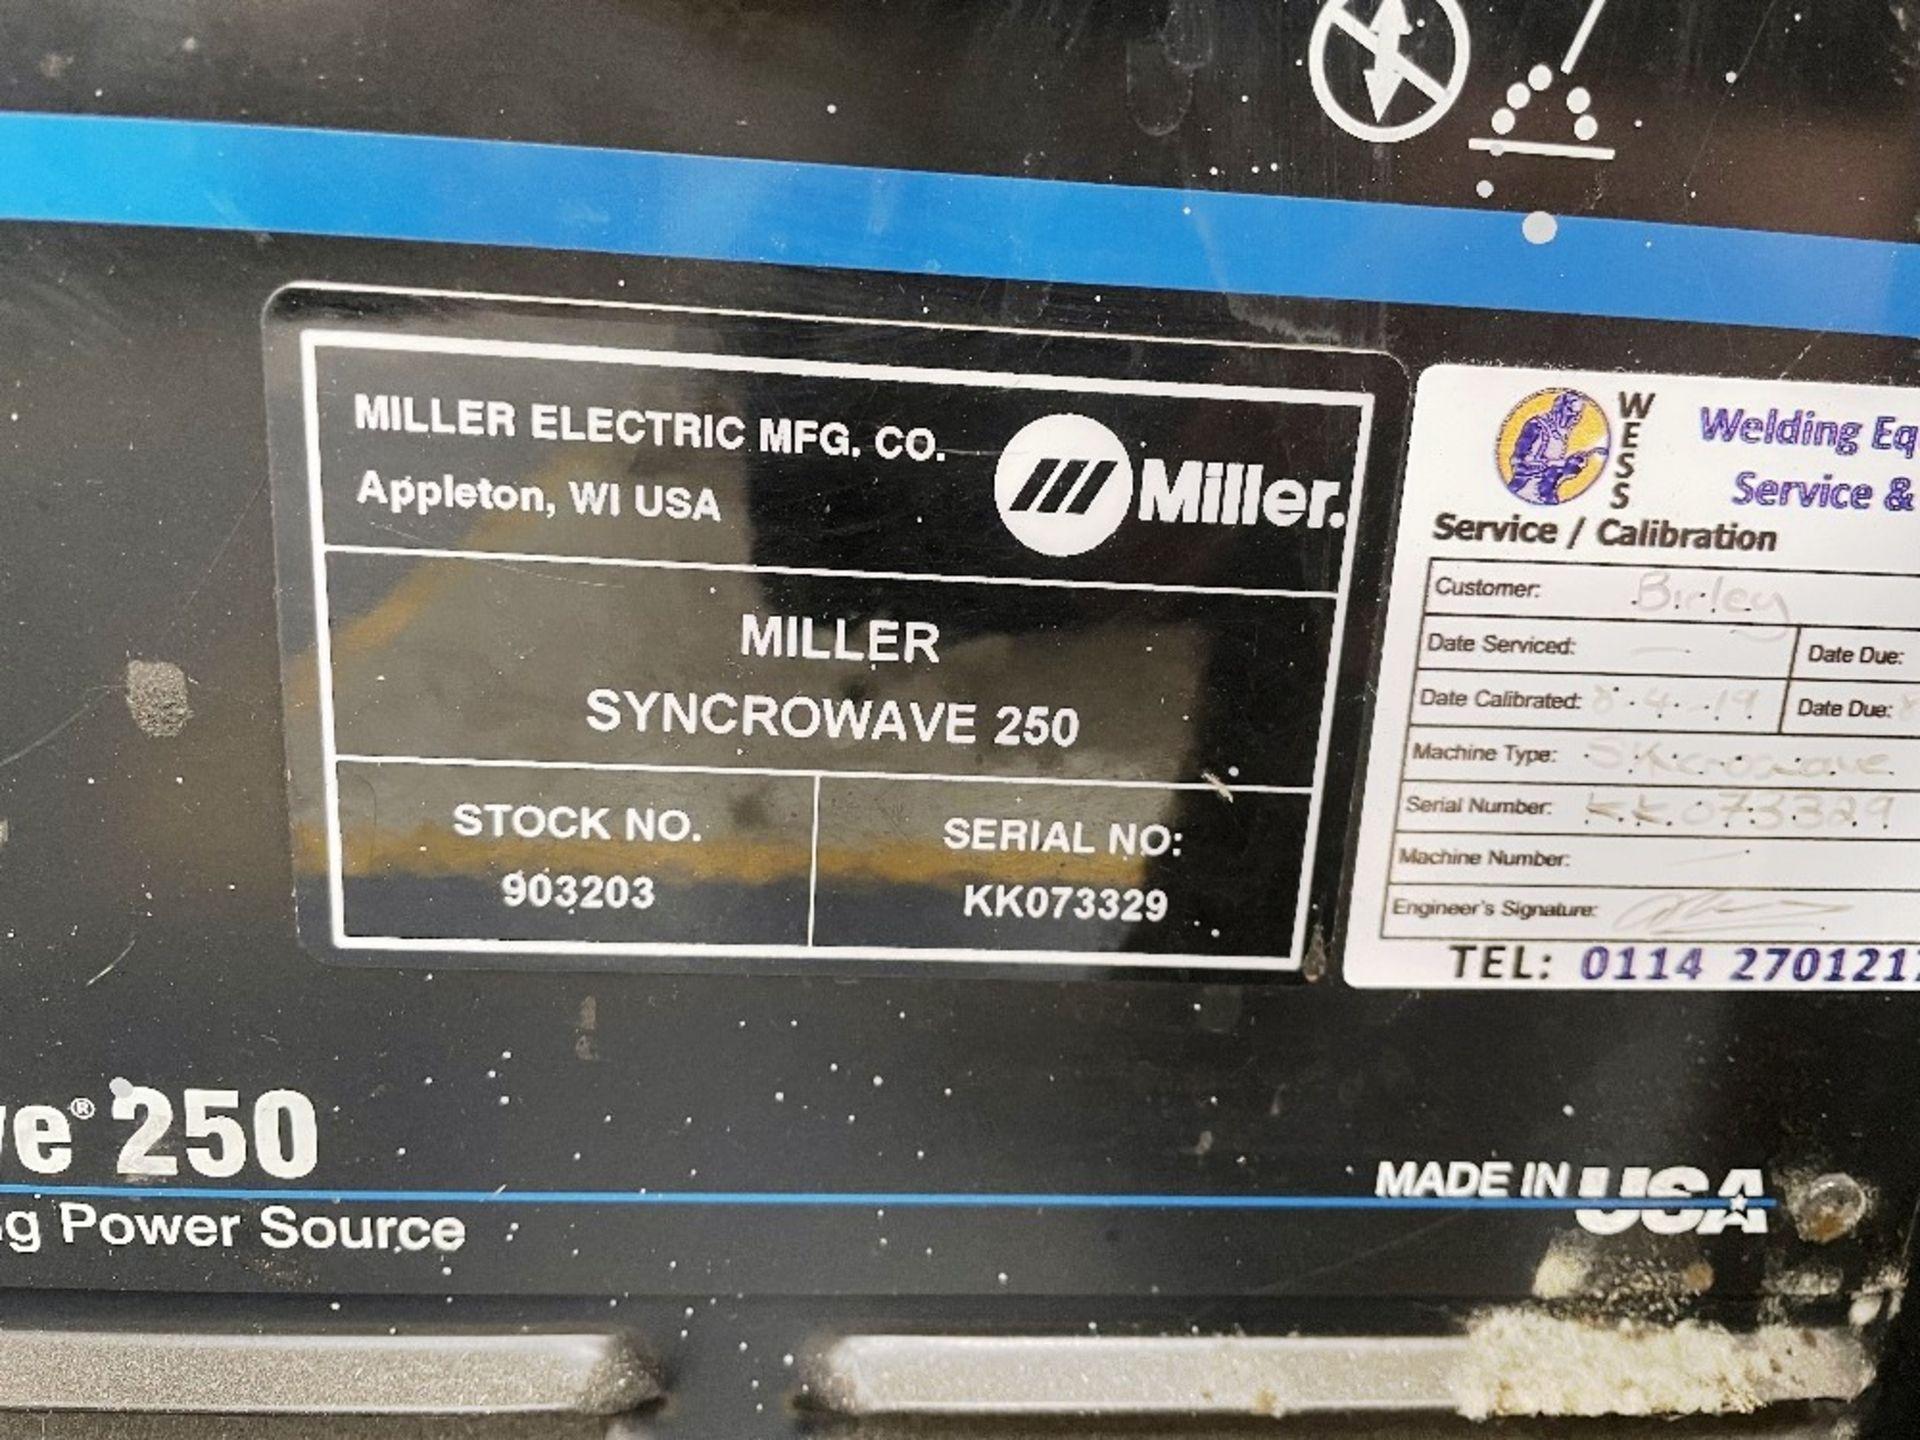 Miller Syncrowave 250 Tig Welder w/ TecArc XC1000 Water Cooler - Image 2 of 6